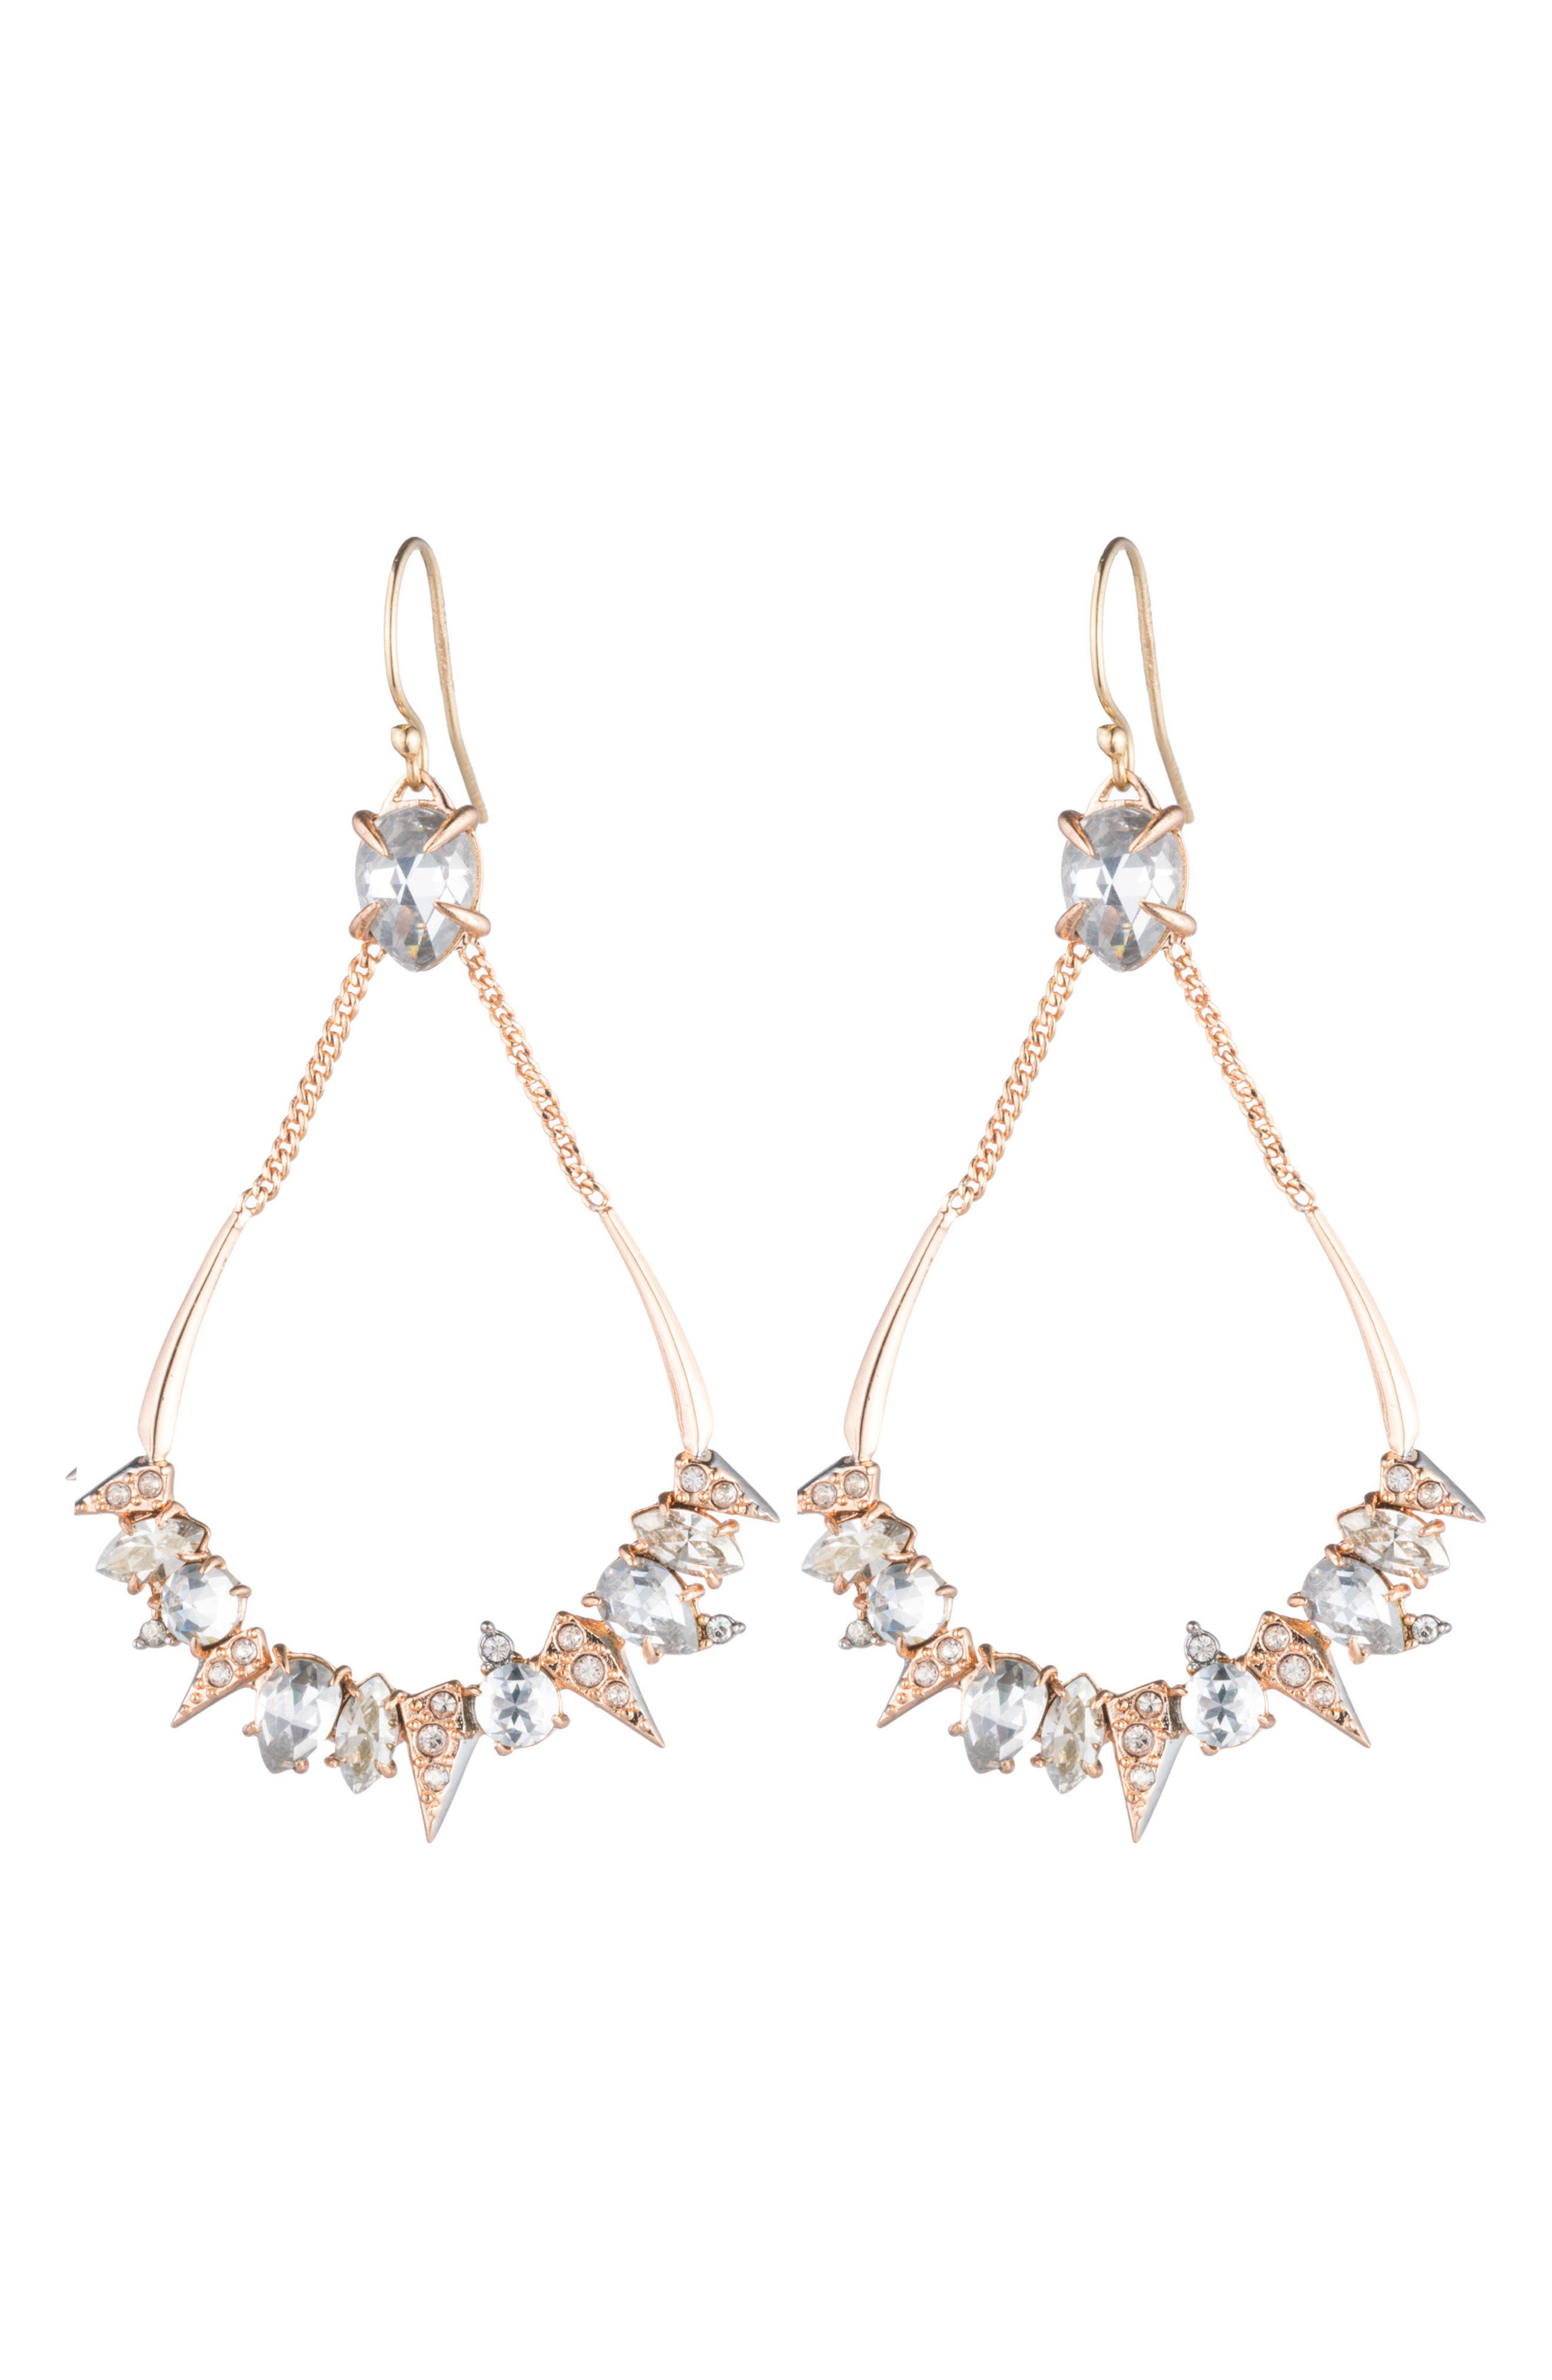 Crystal Encrusted Mosaic Drop Earrings,                             Alternate thumbnail 2, color,                             Rose Gold